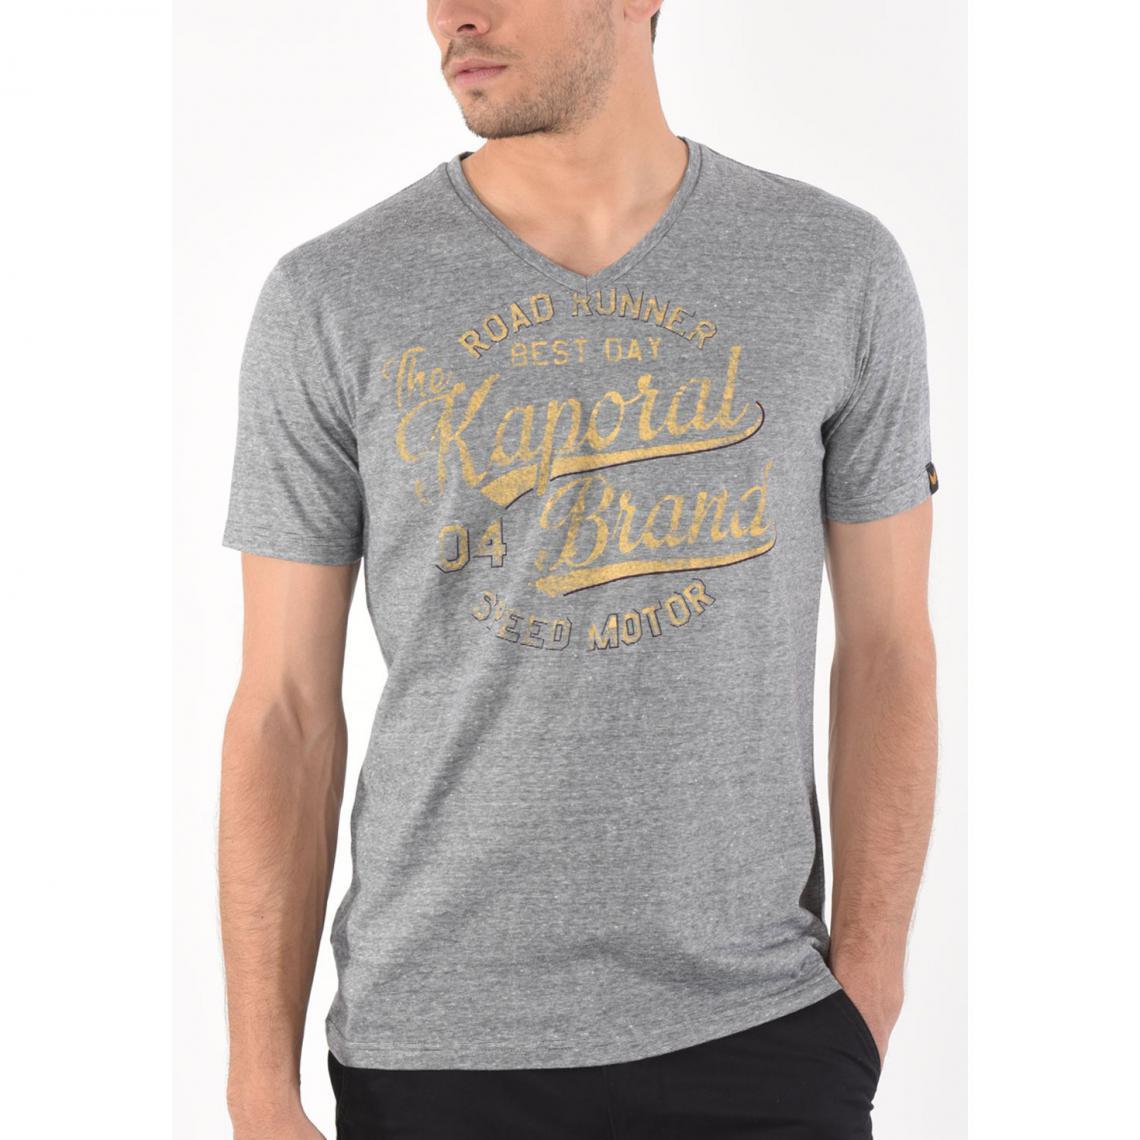 81d13ed924fe5 T-shirt manches courtes Japan homme Kaporal - Gris Anthracite Kaporal 5  Homme